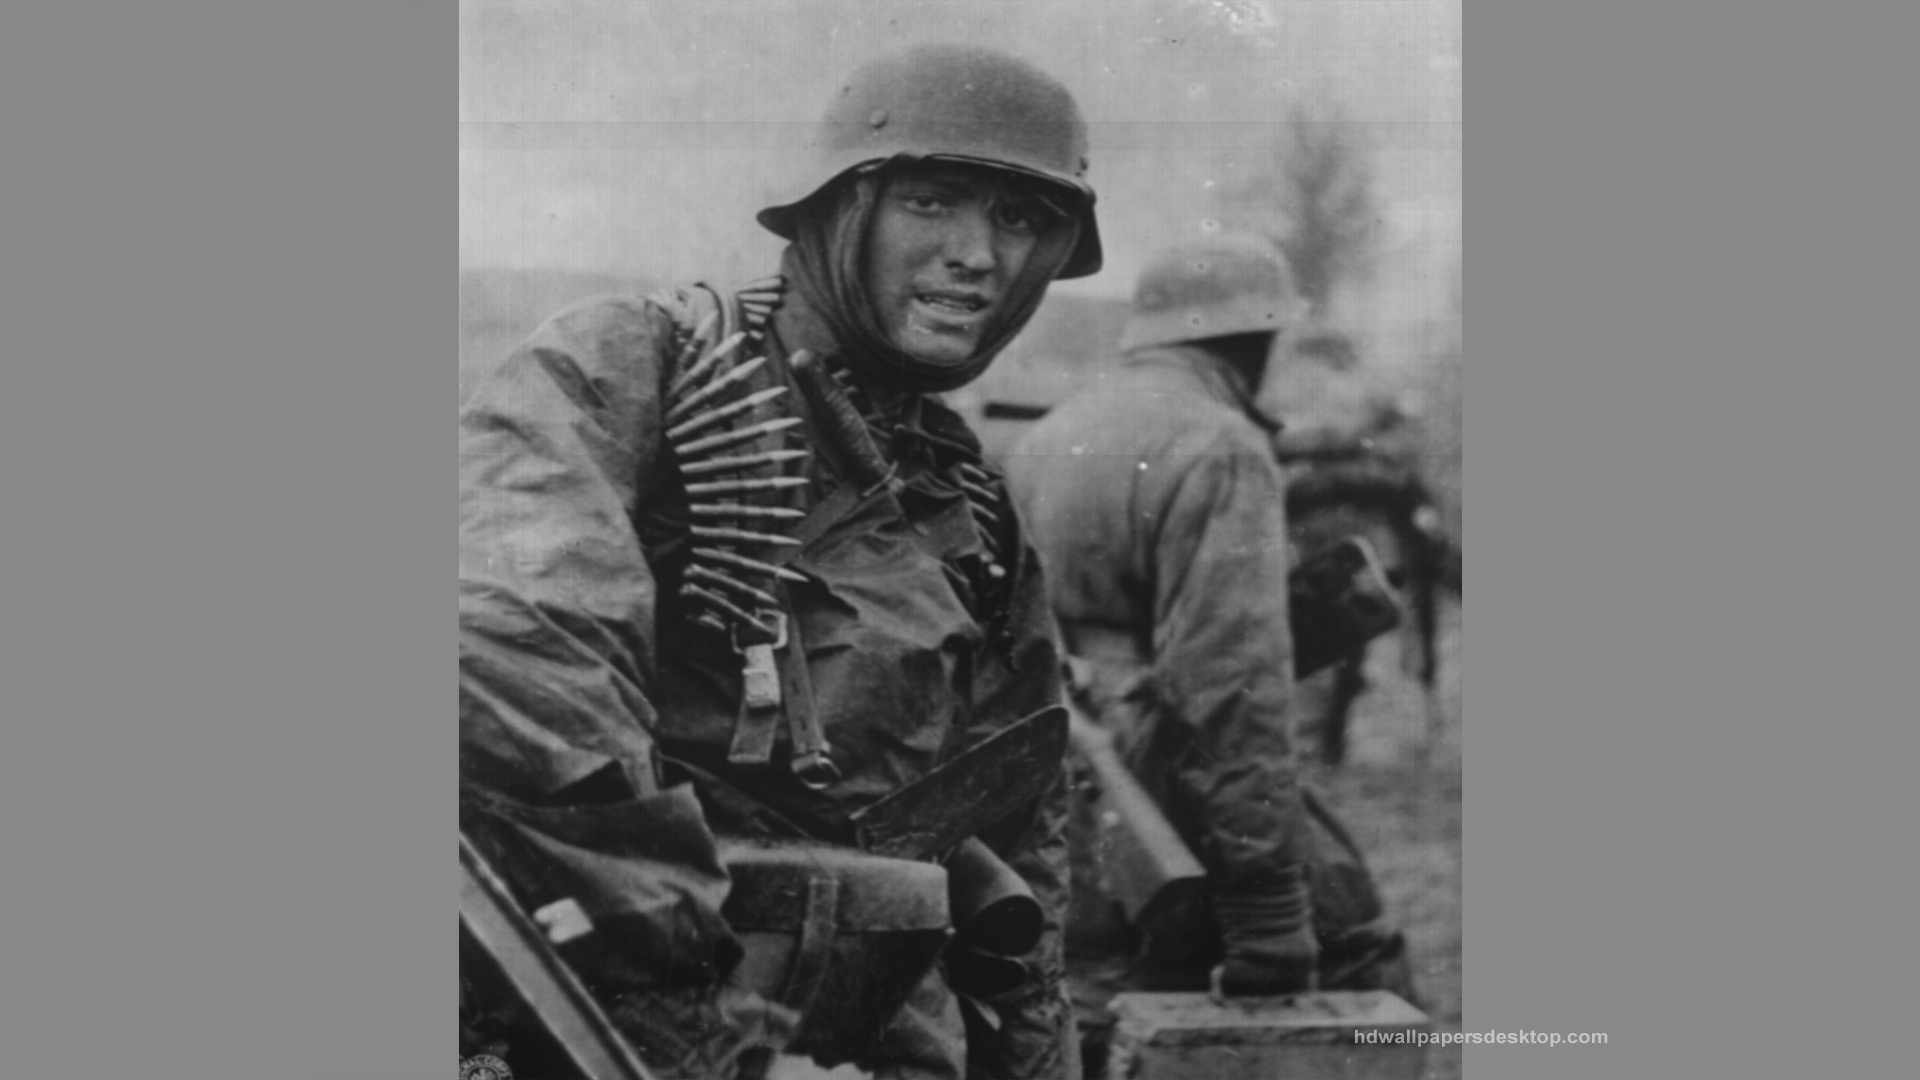 ww2 german army wallpaper - photo #19